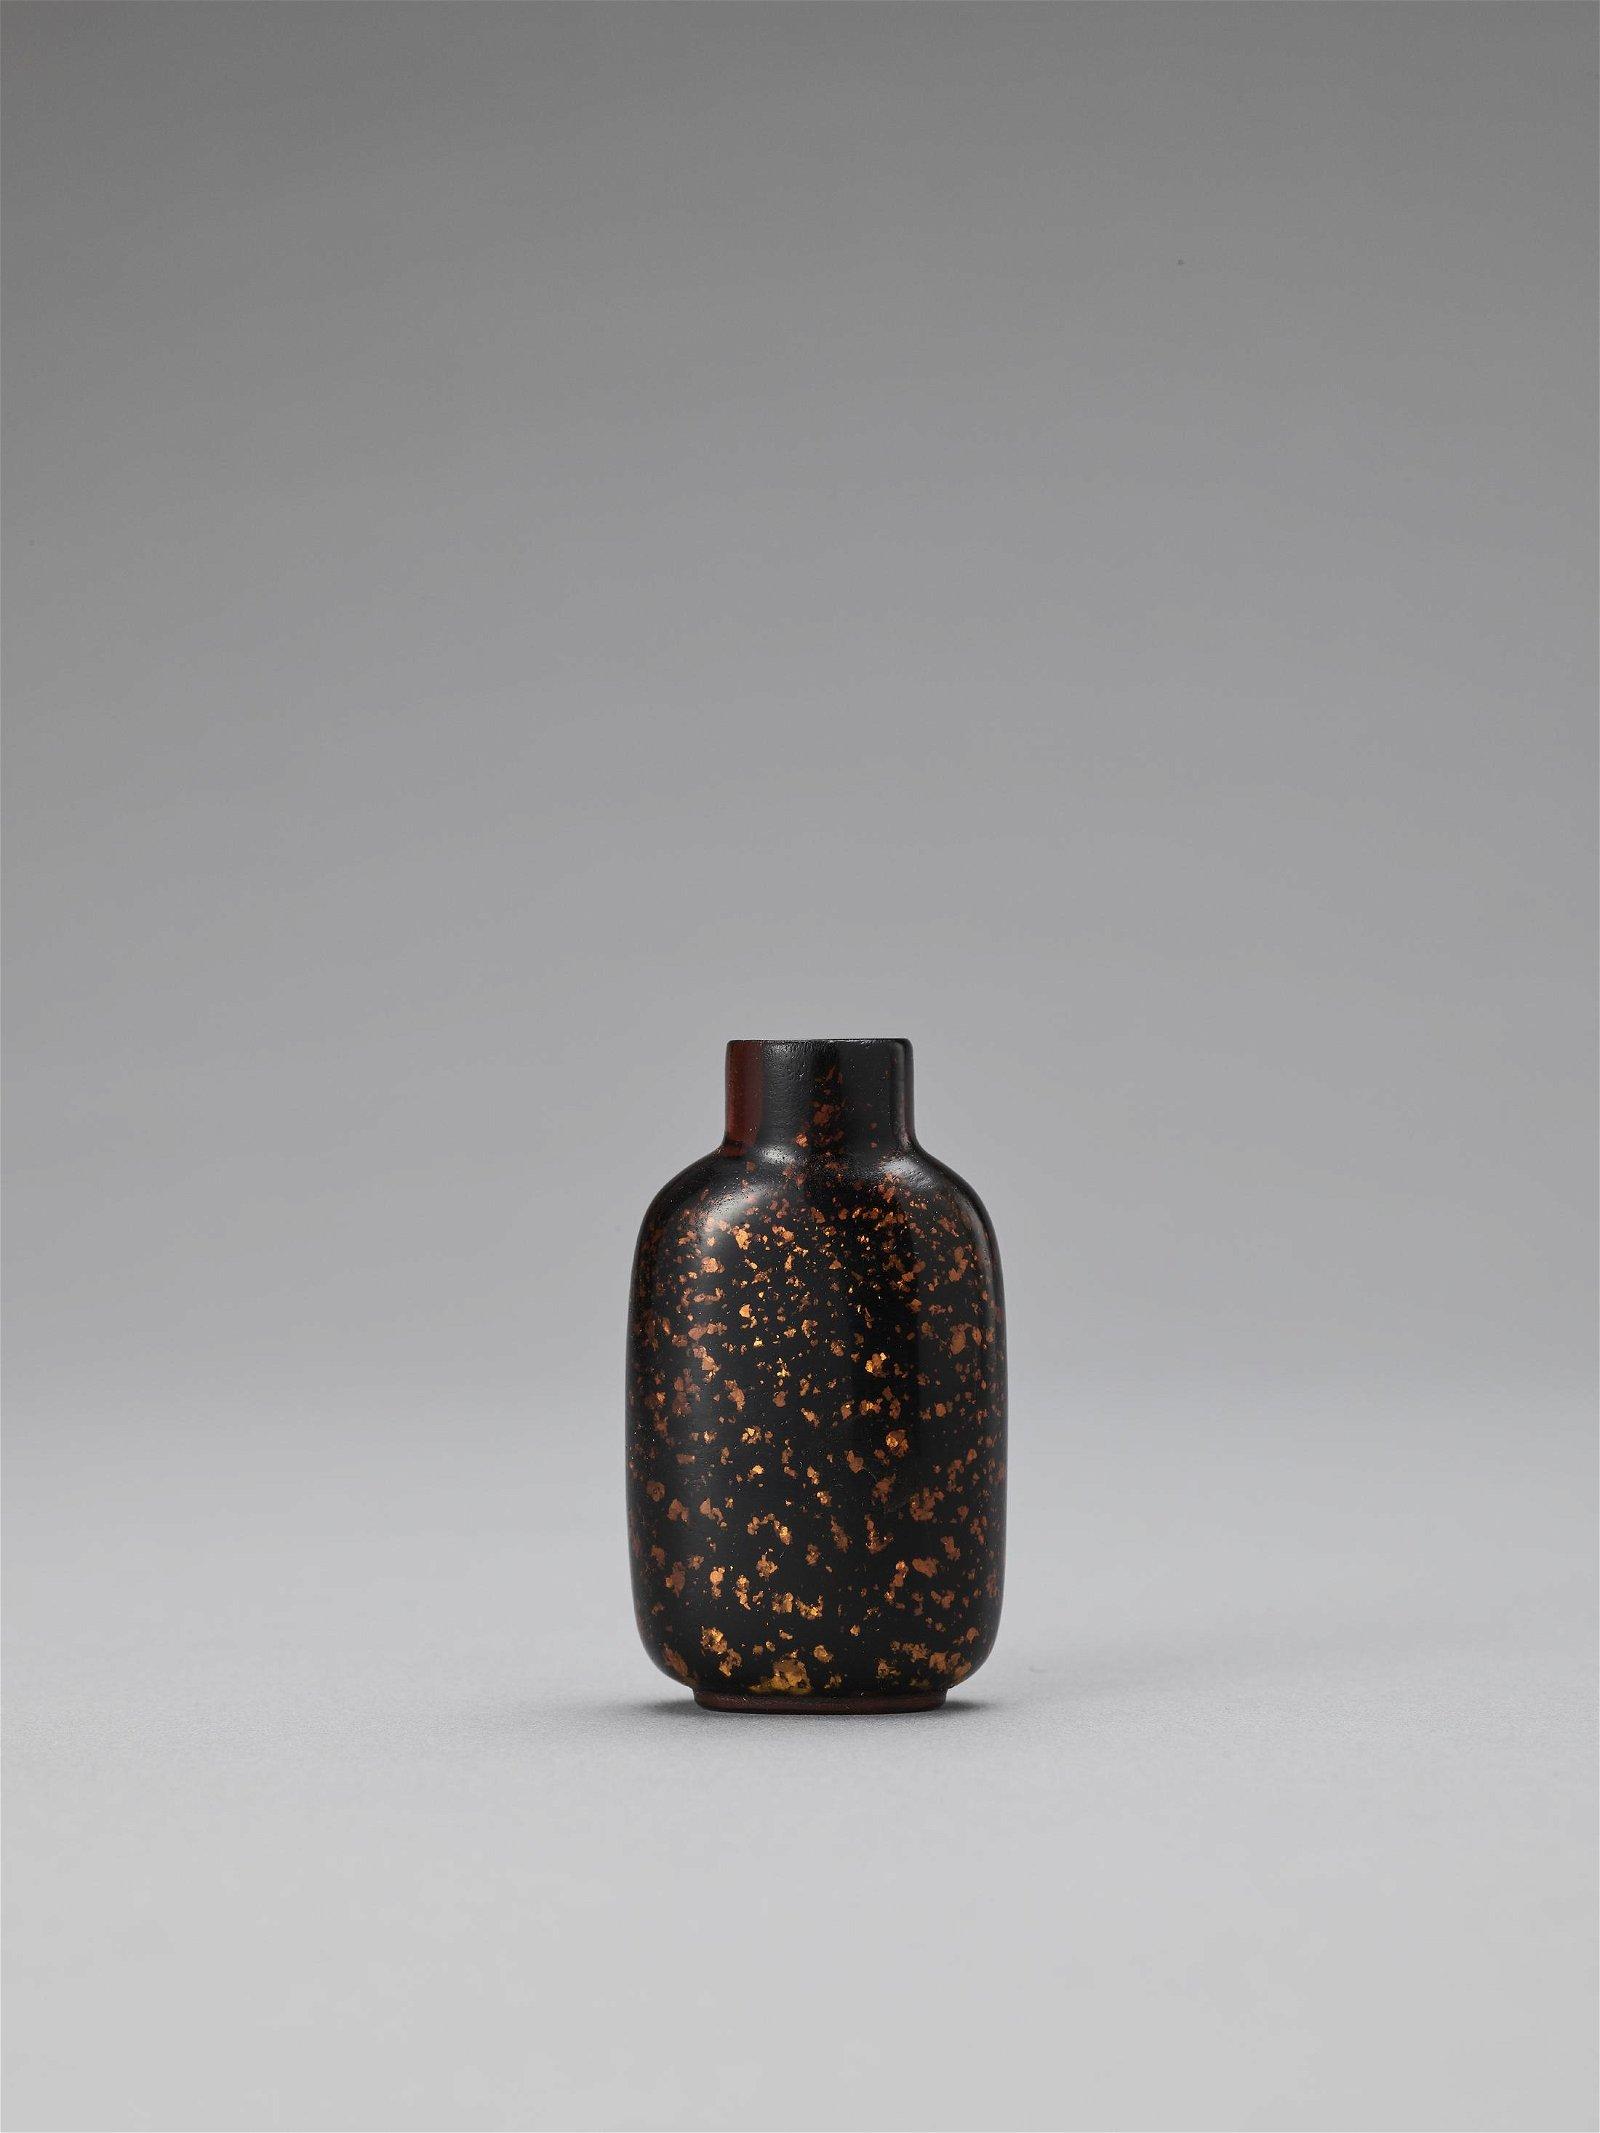 GOLD-SPECKLED AMBER AVENTURINE GLASS SNUFF BOTTLE